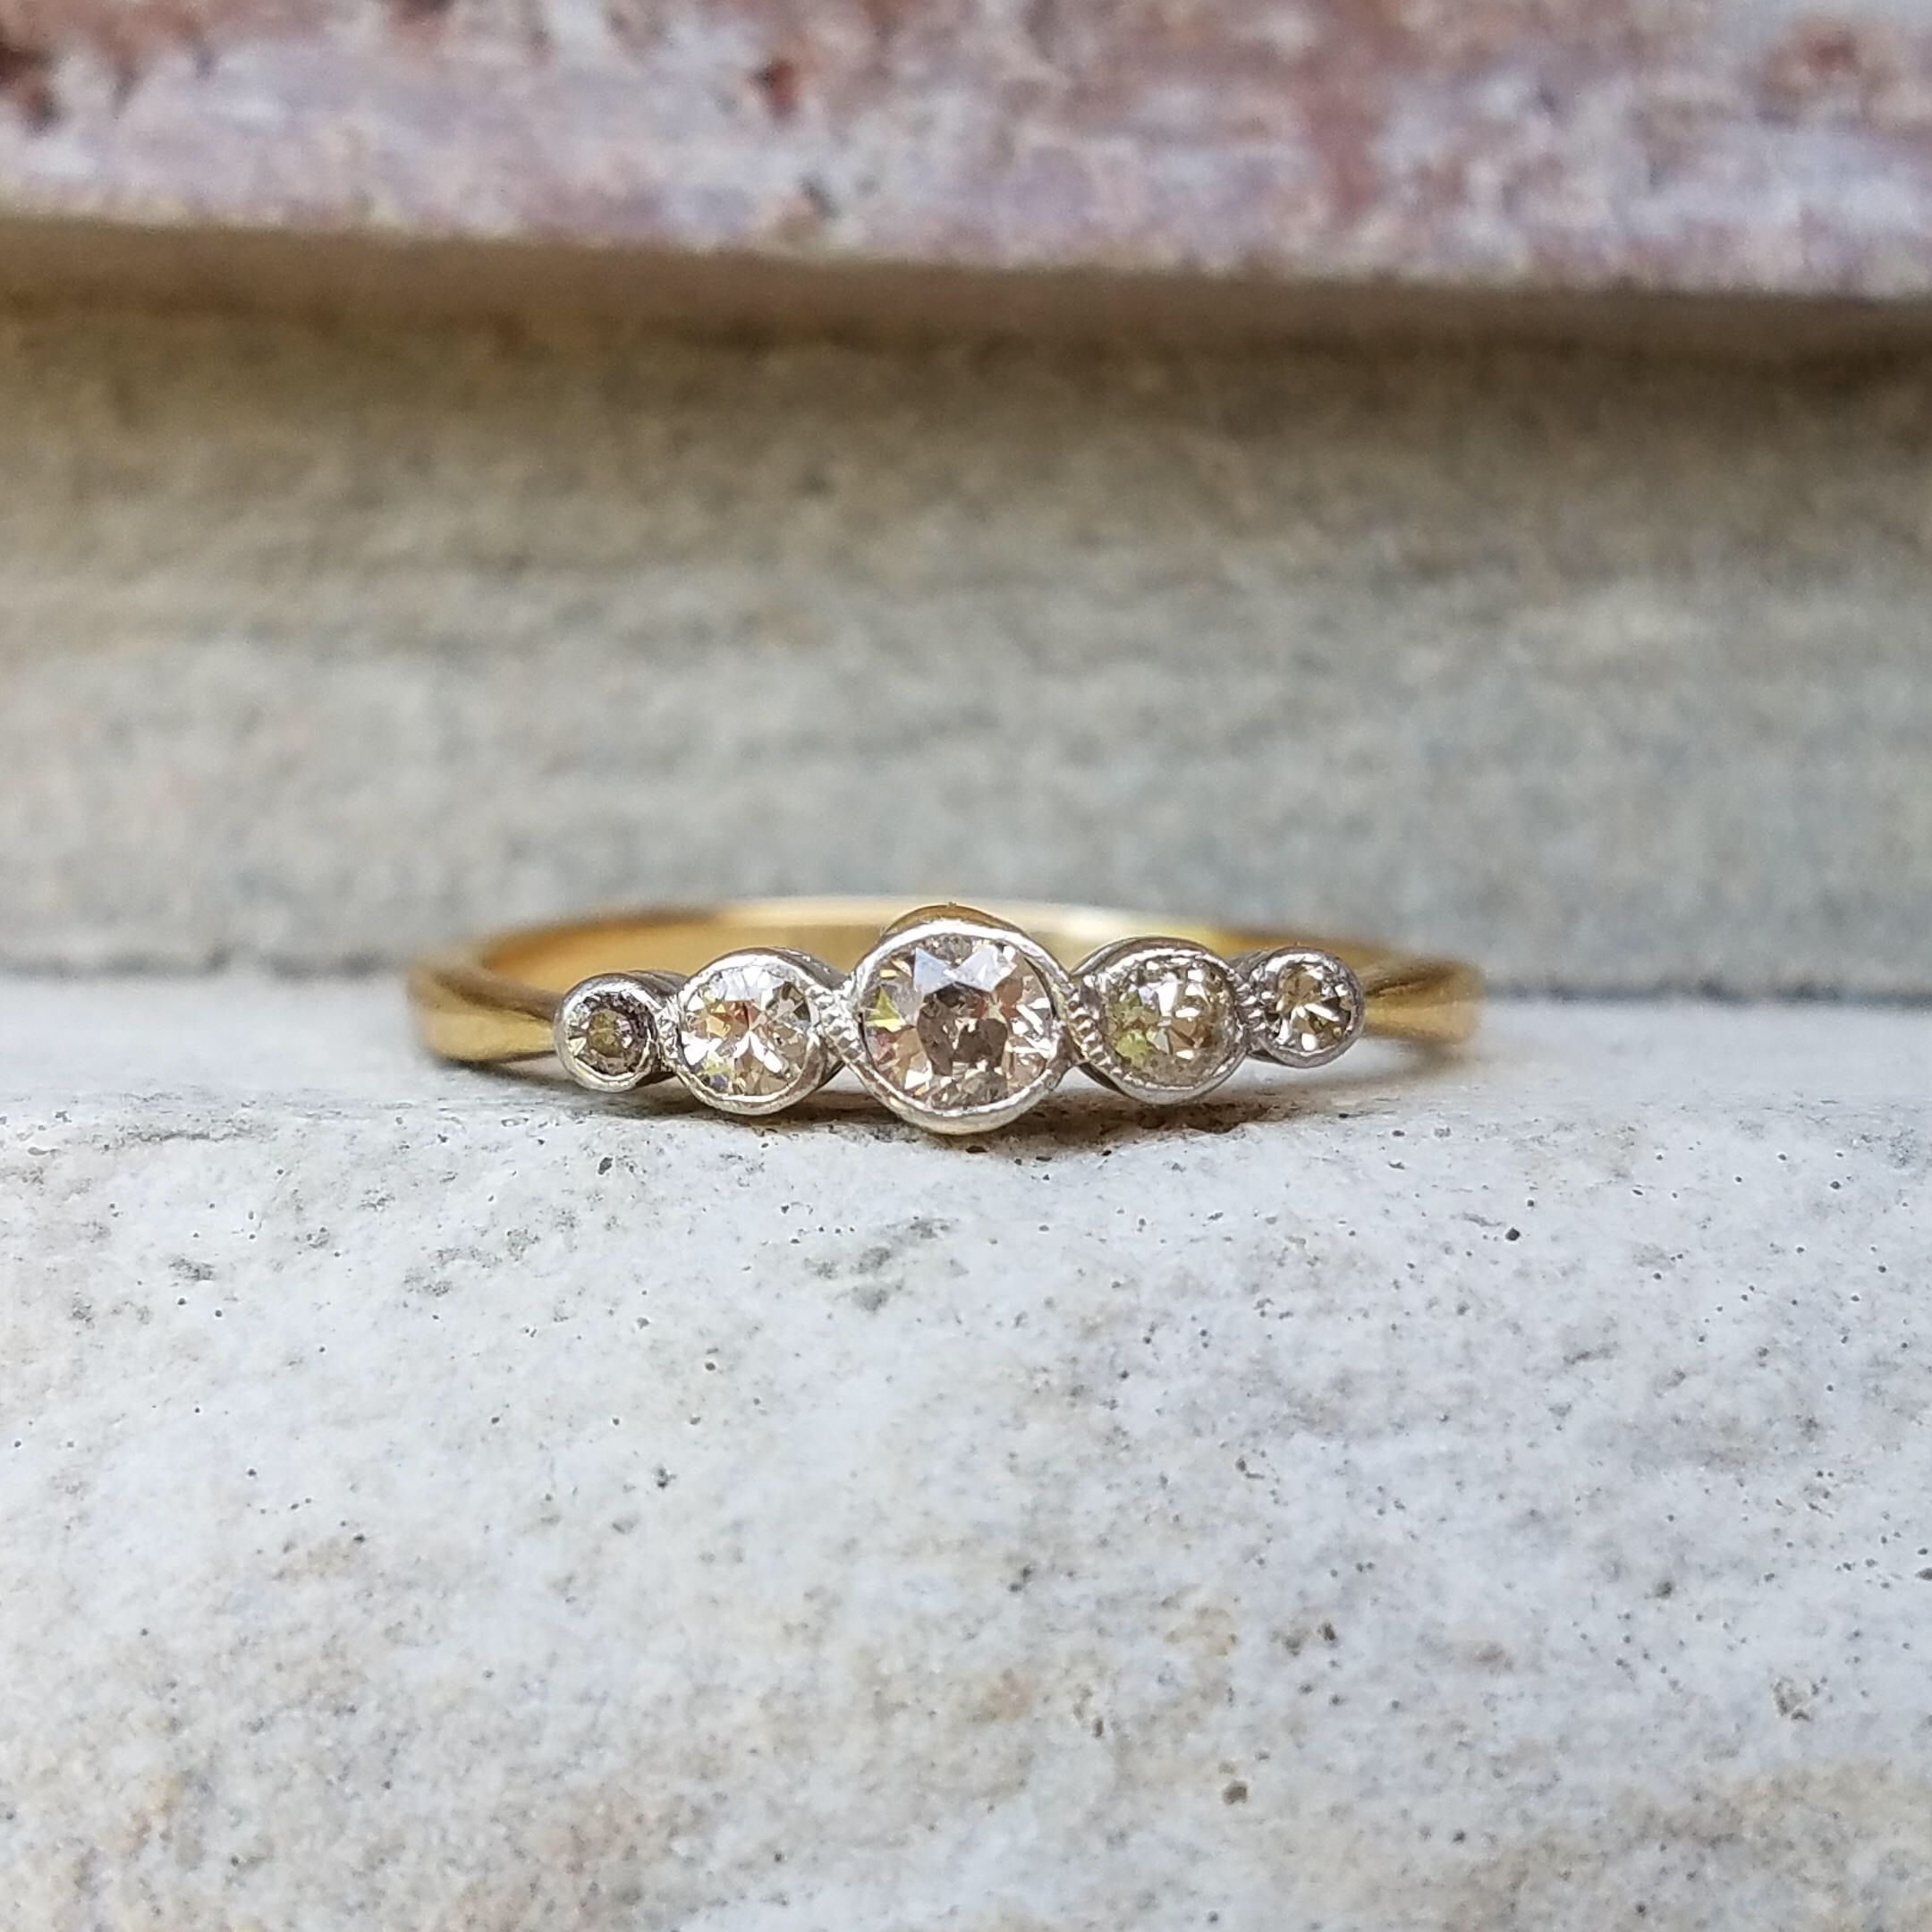 Luxury Antique Wedding Band Rings